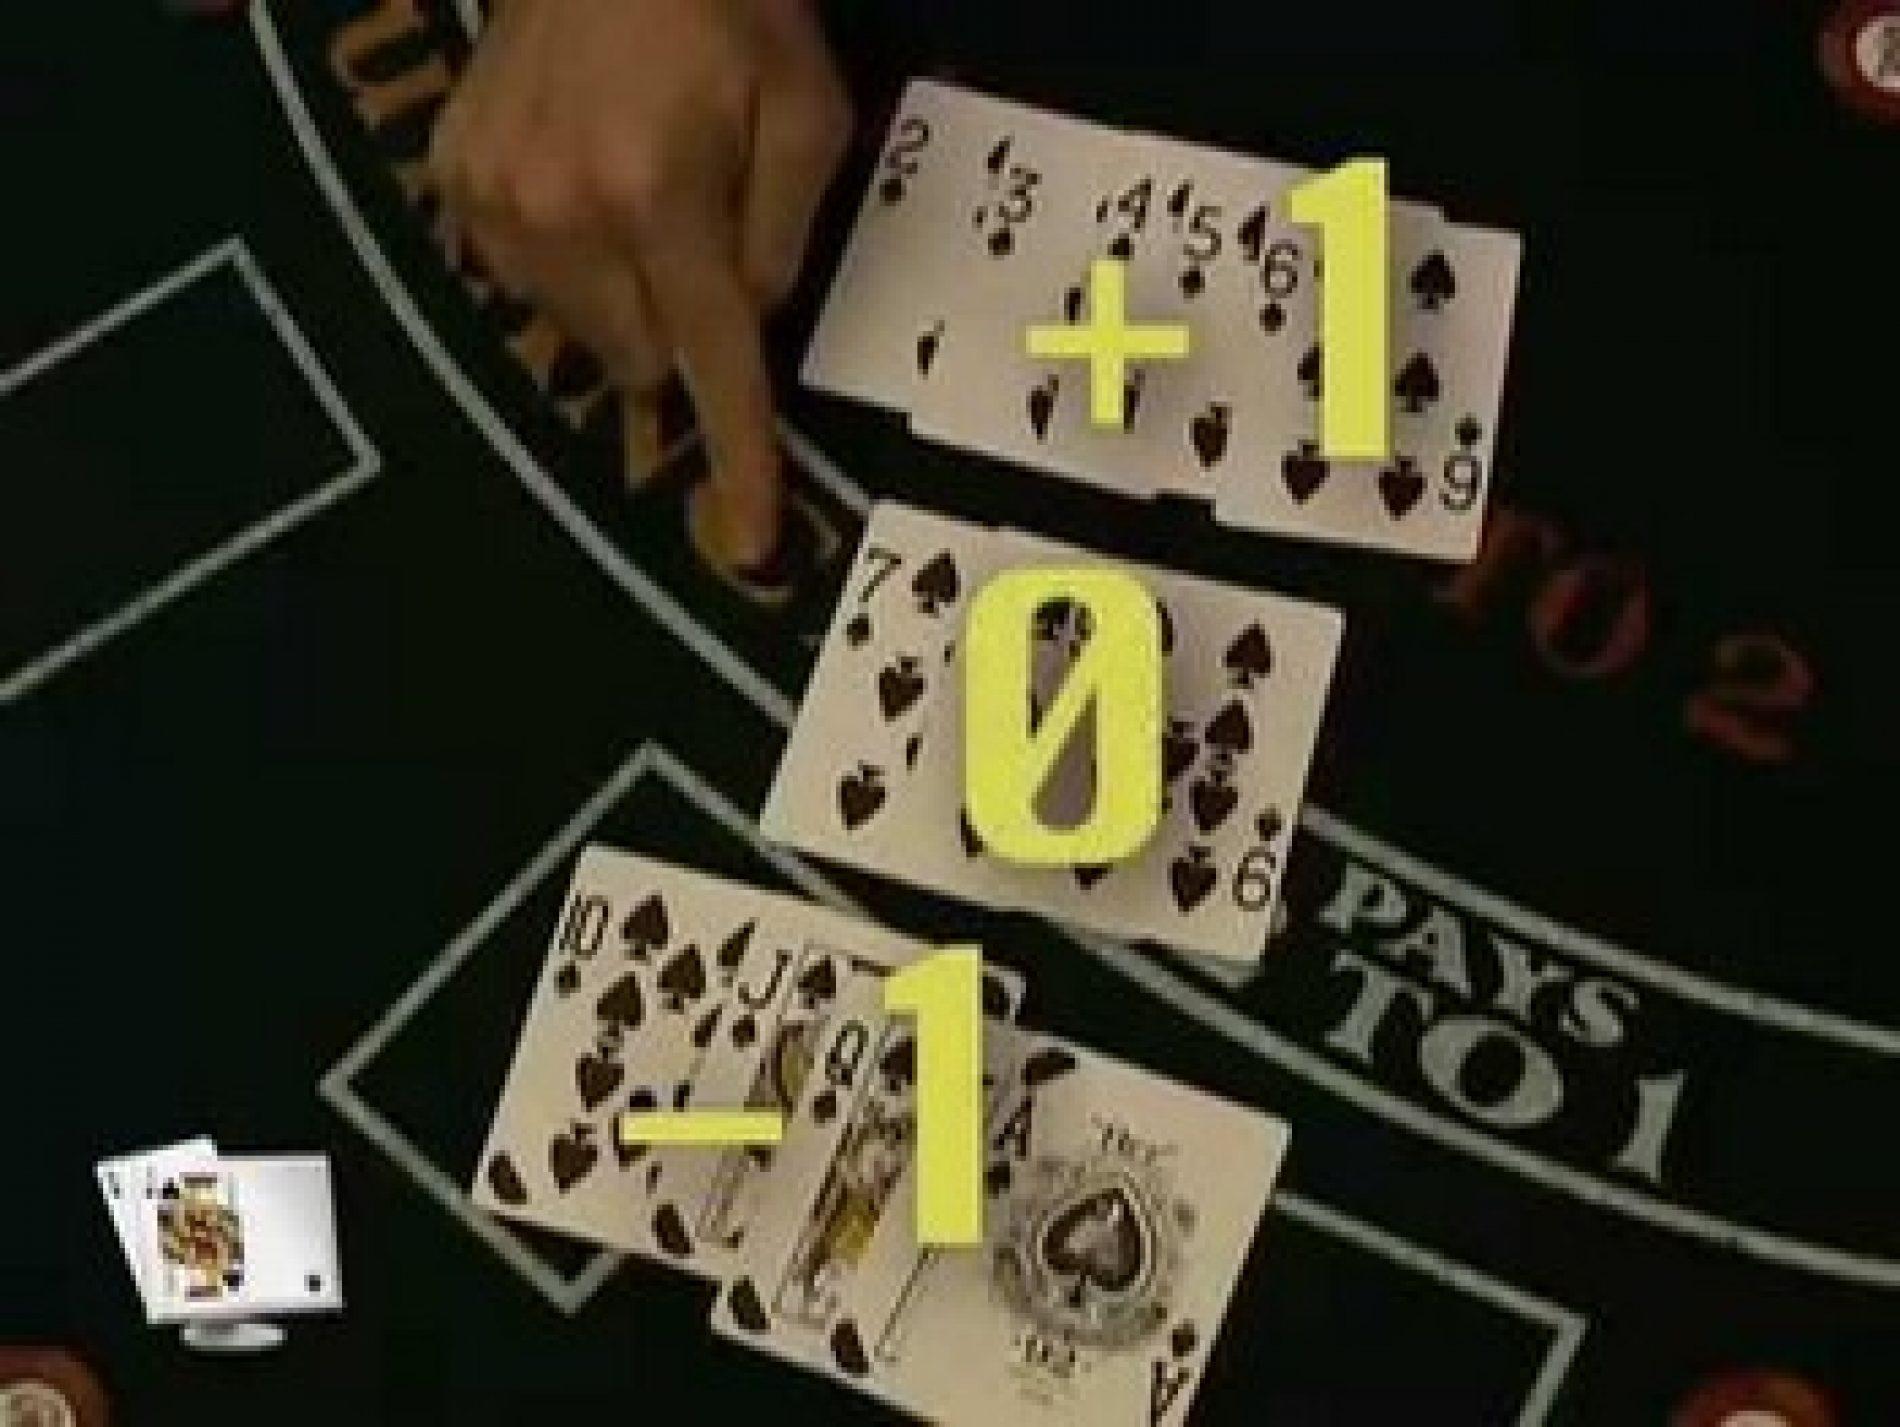 Automatic monkey blackjack